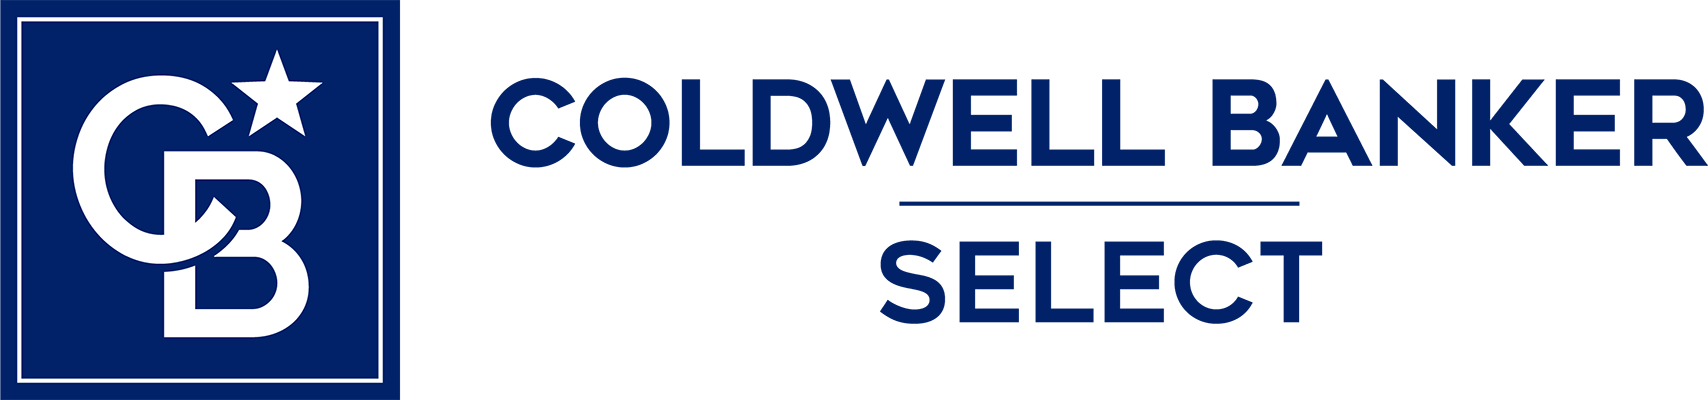 Paula Crain - Coldwell Banker Select Logo